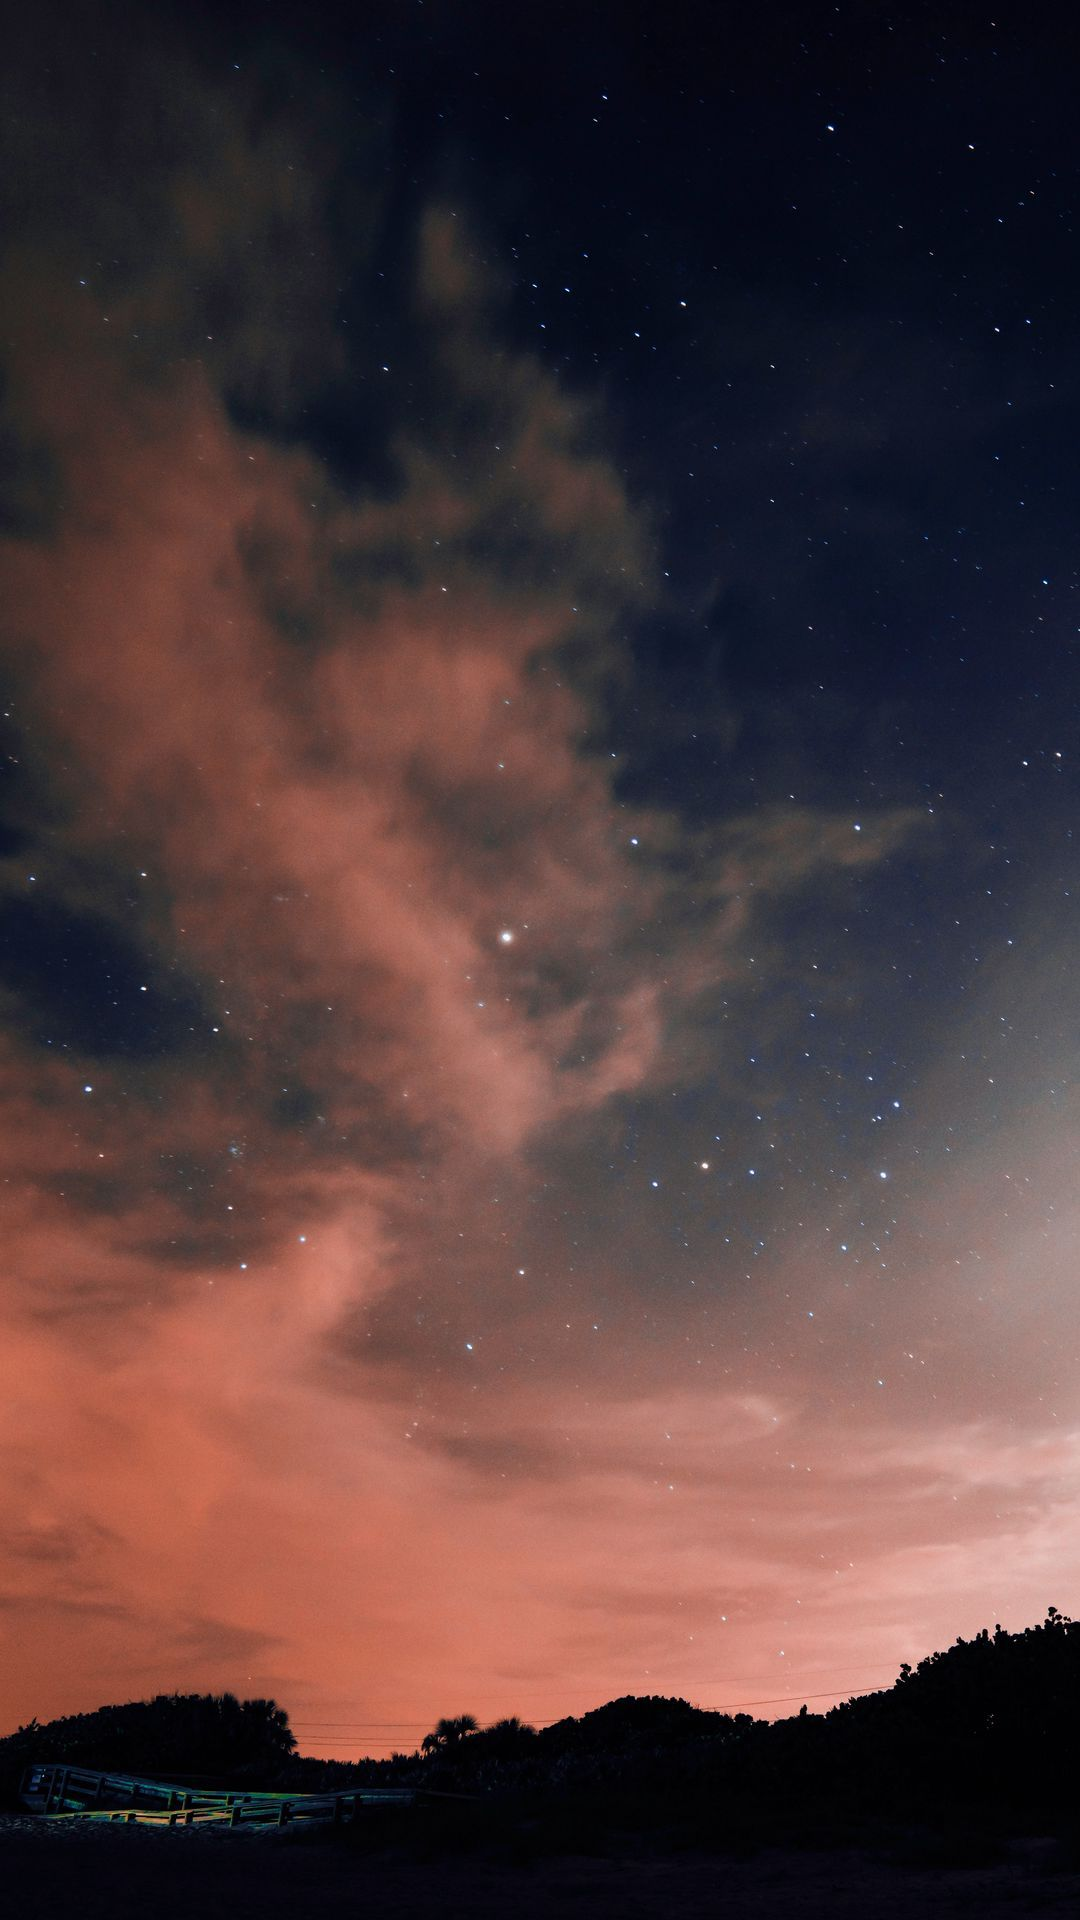 Download wallpaper 1080x1920 night, sky, stars, clouds samsung galaxy s4, s5, note, sony xperia z, z1, z2, z3, htc one, lenovo vibe hd background